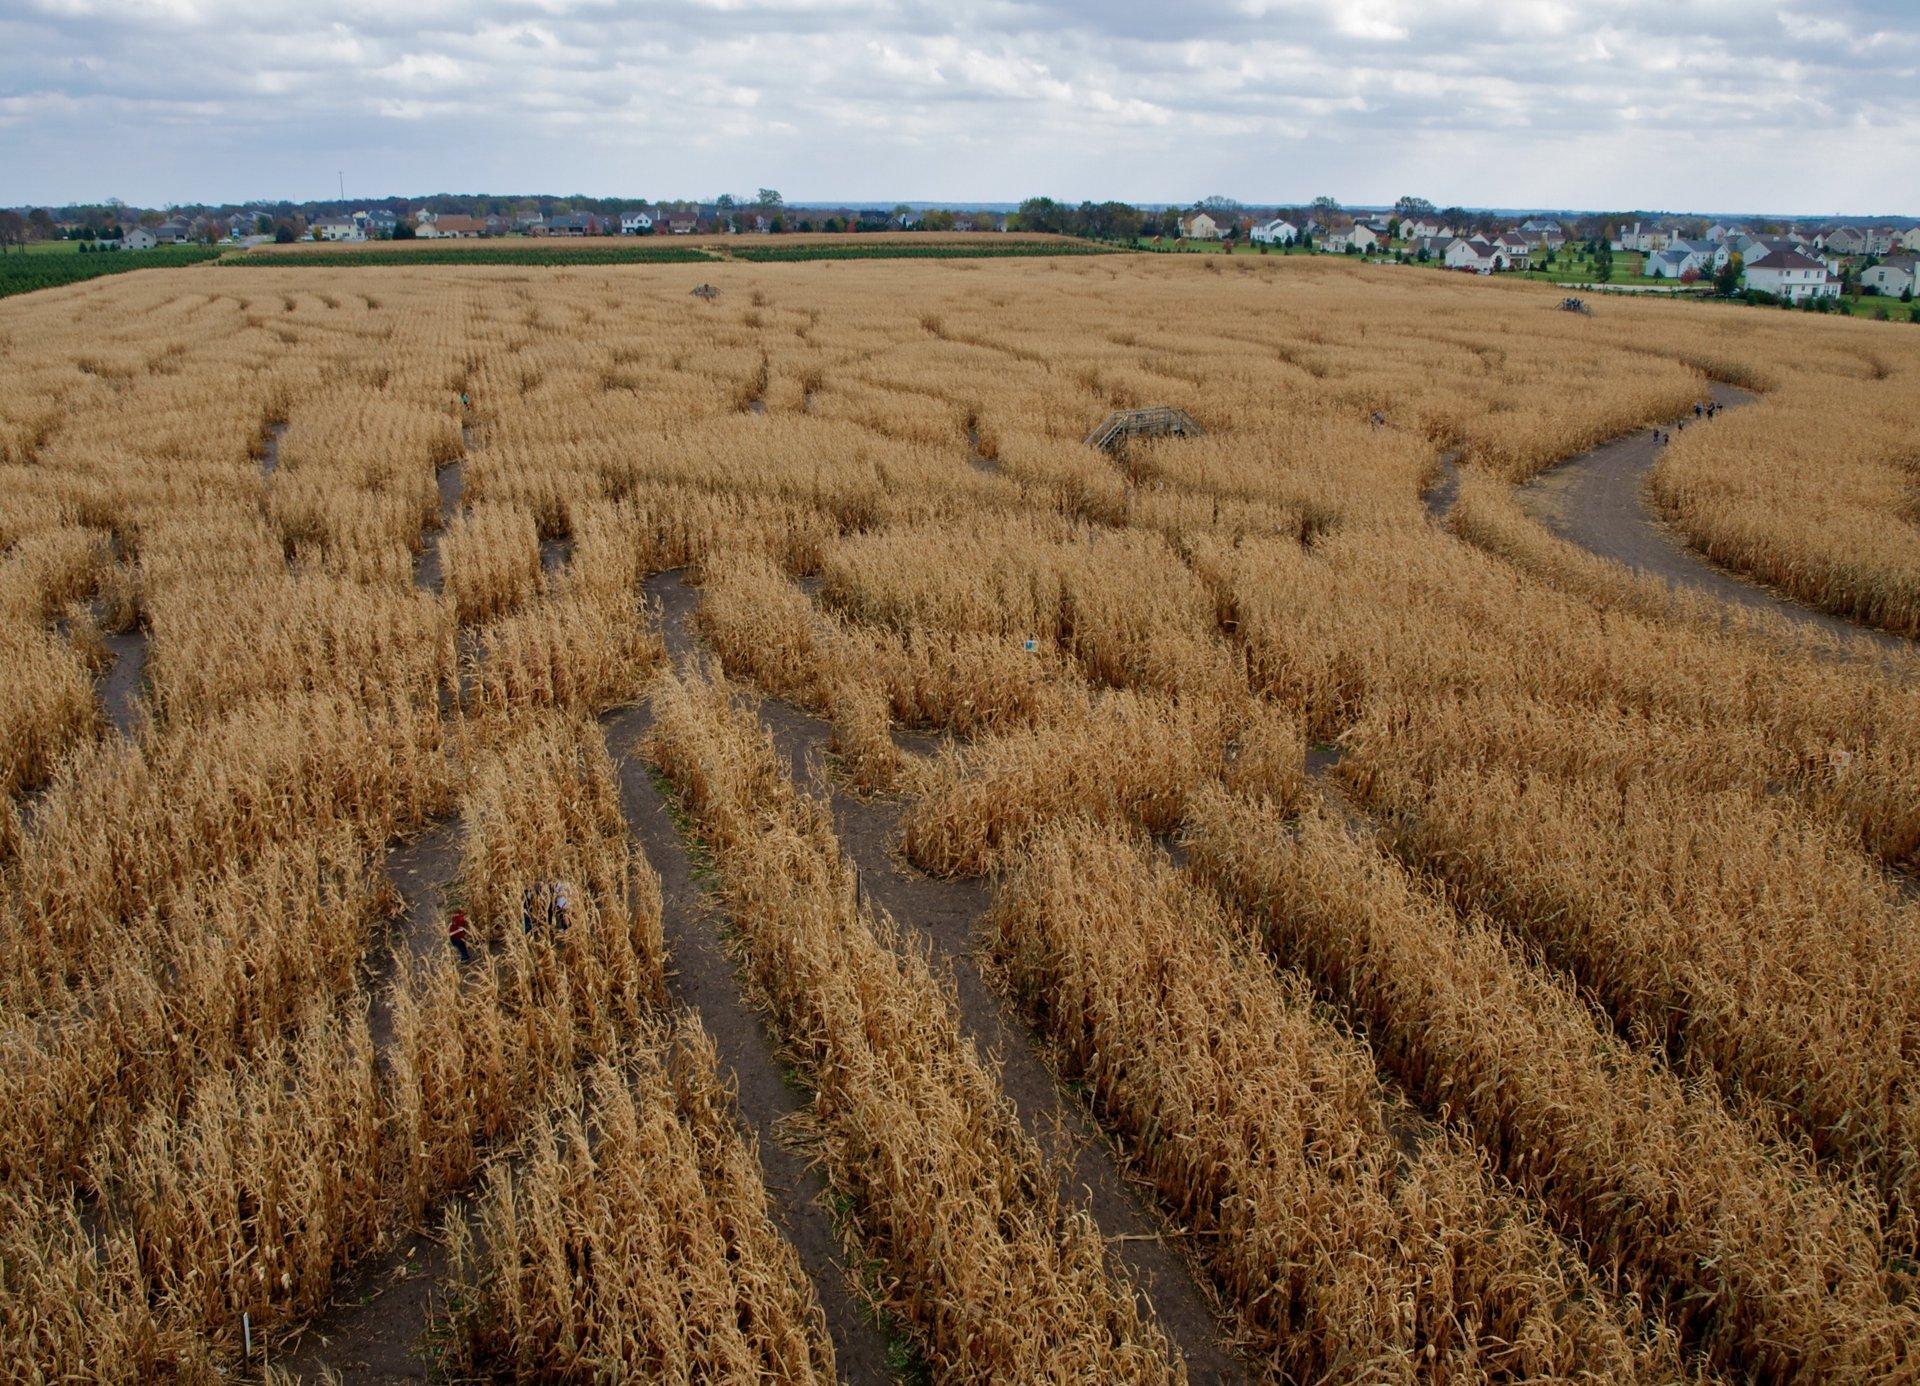 Best time to see Richardson Adventure Farm Corn Maze in Illinois 2020